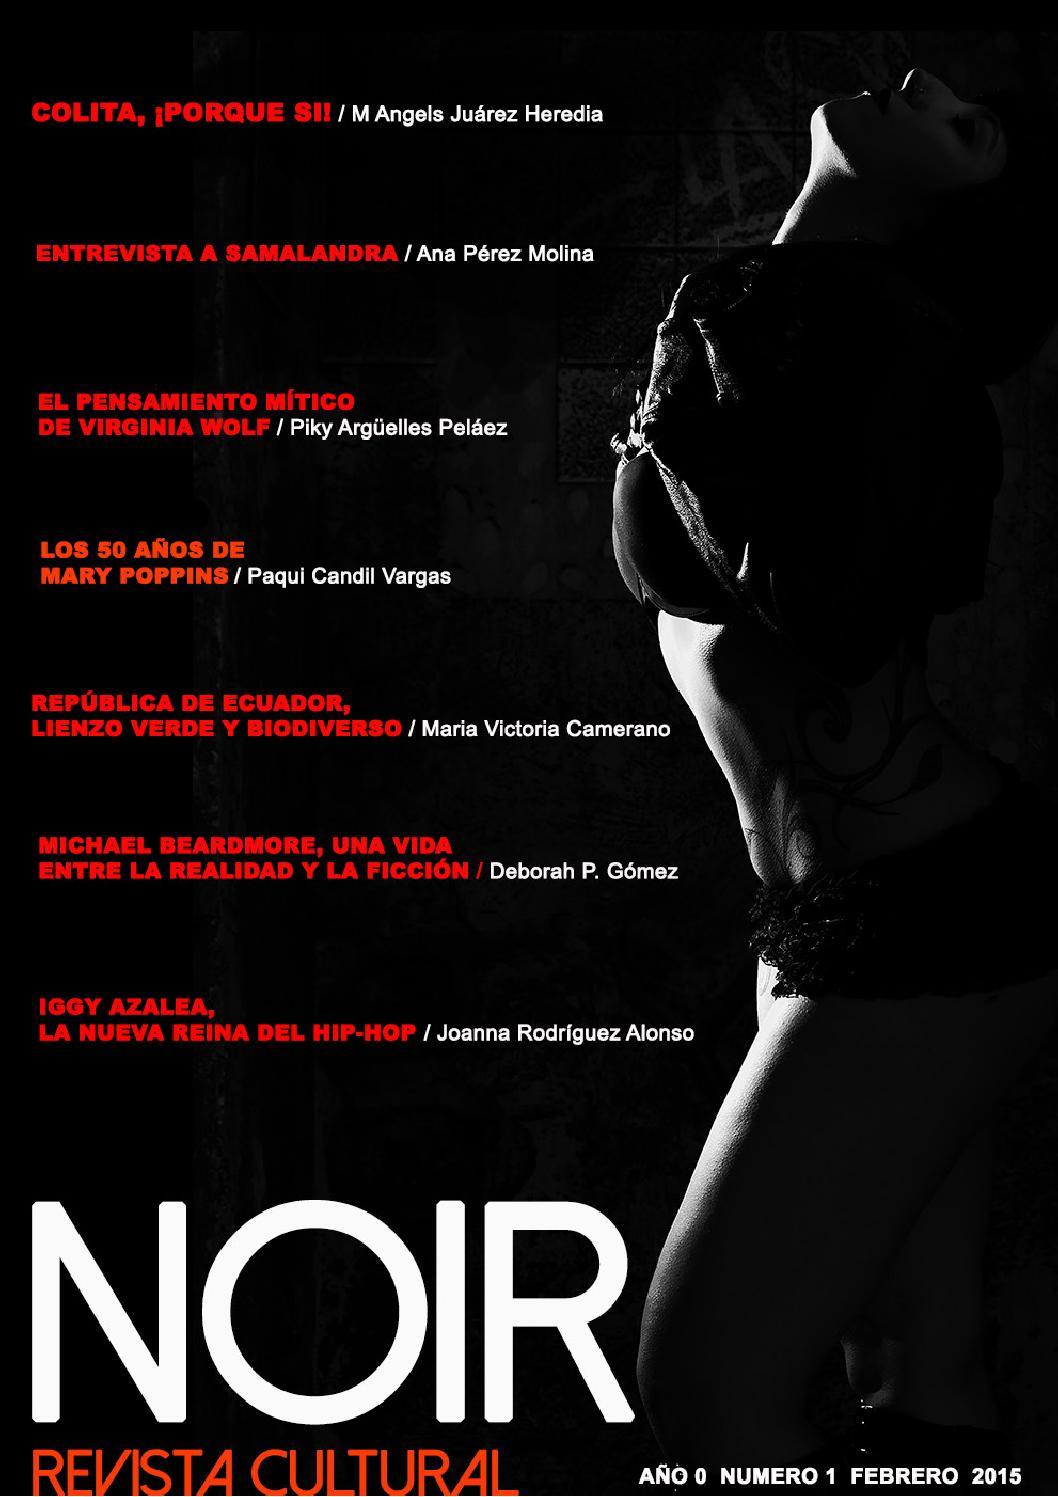 Noir, Revista Cultural. Num. 1 Febrero 2015 - Magazine cover